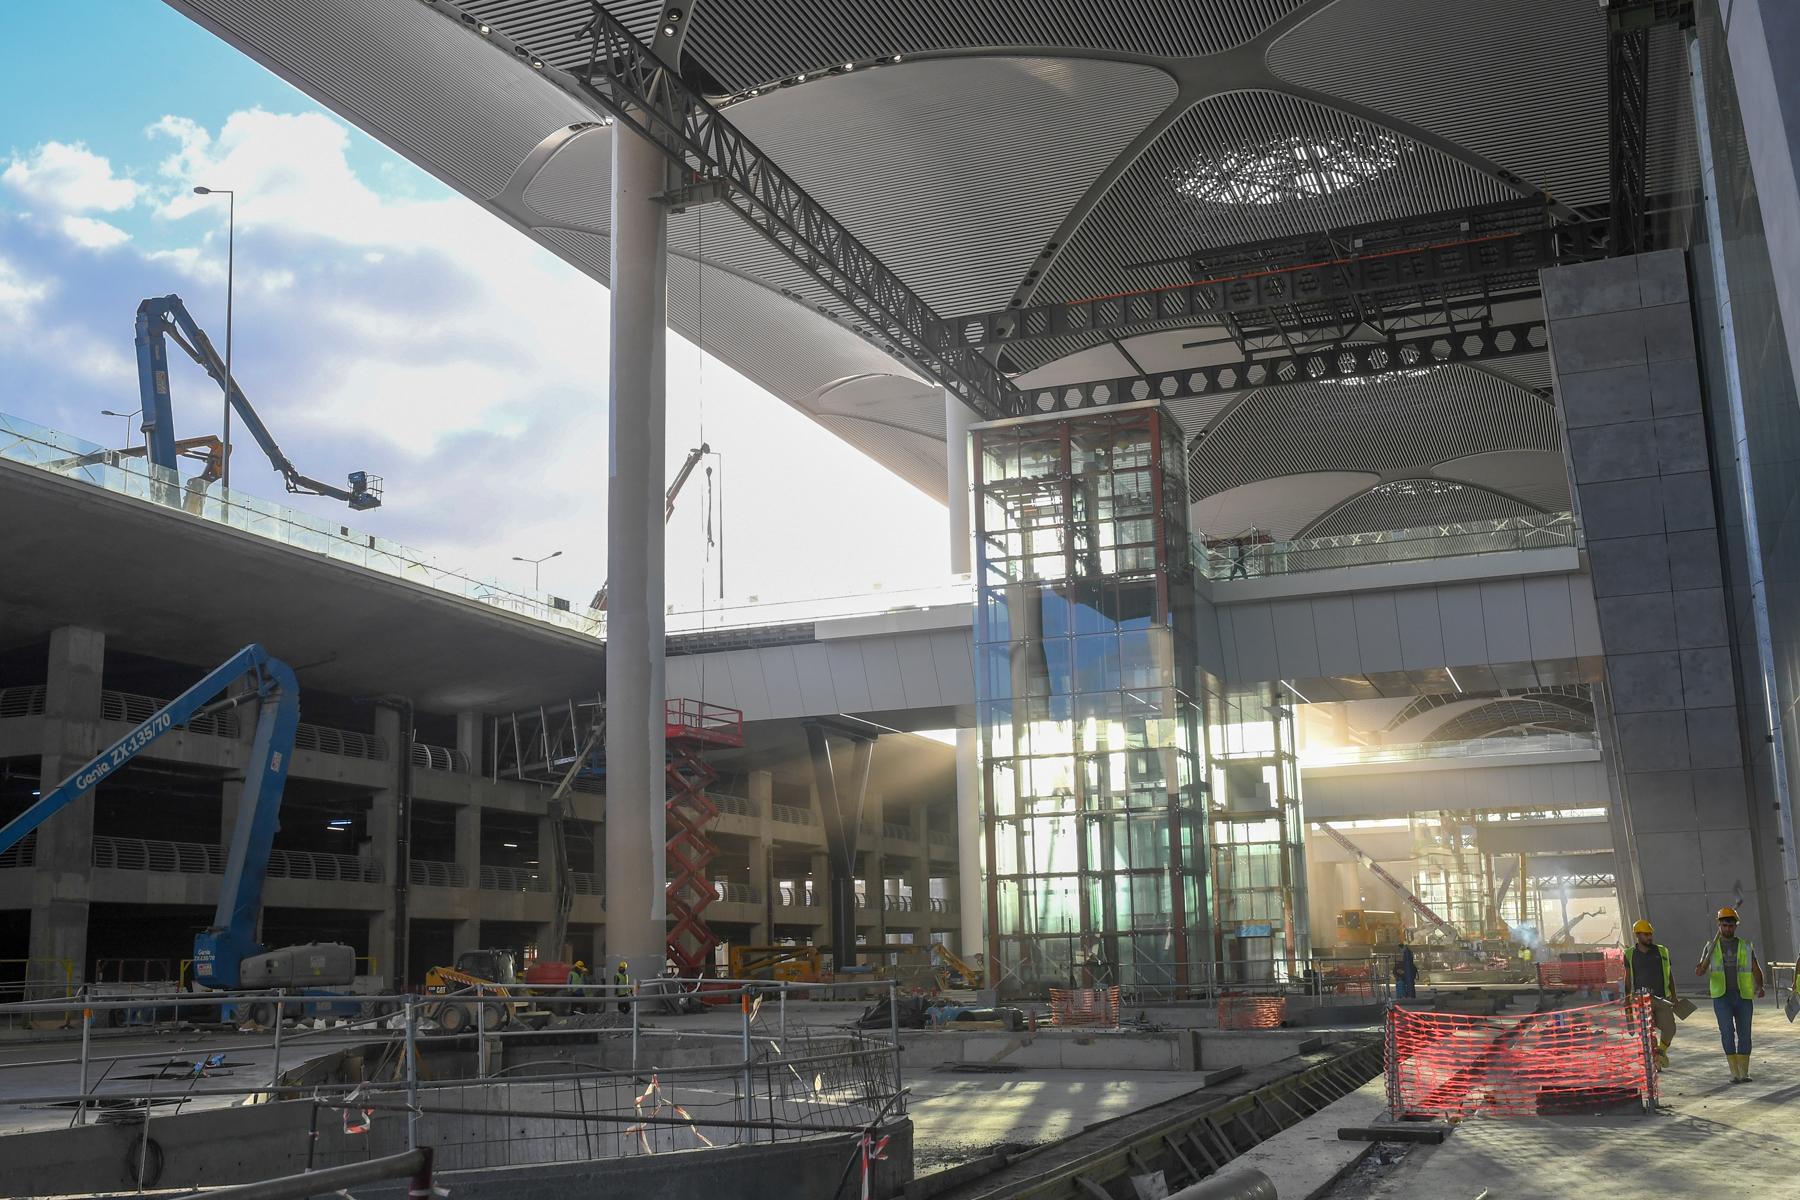 istanbul airport exterior